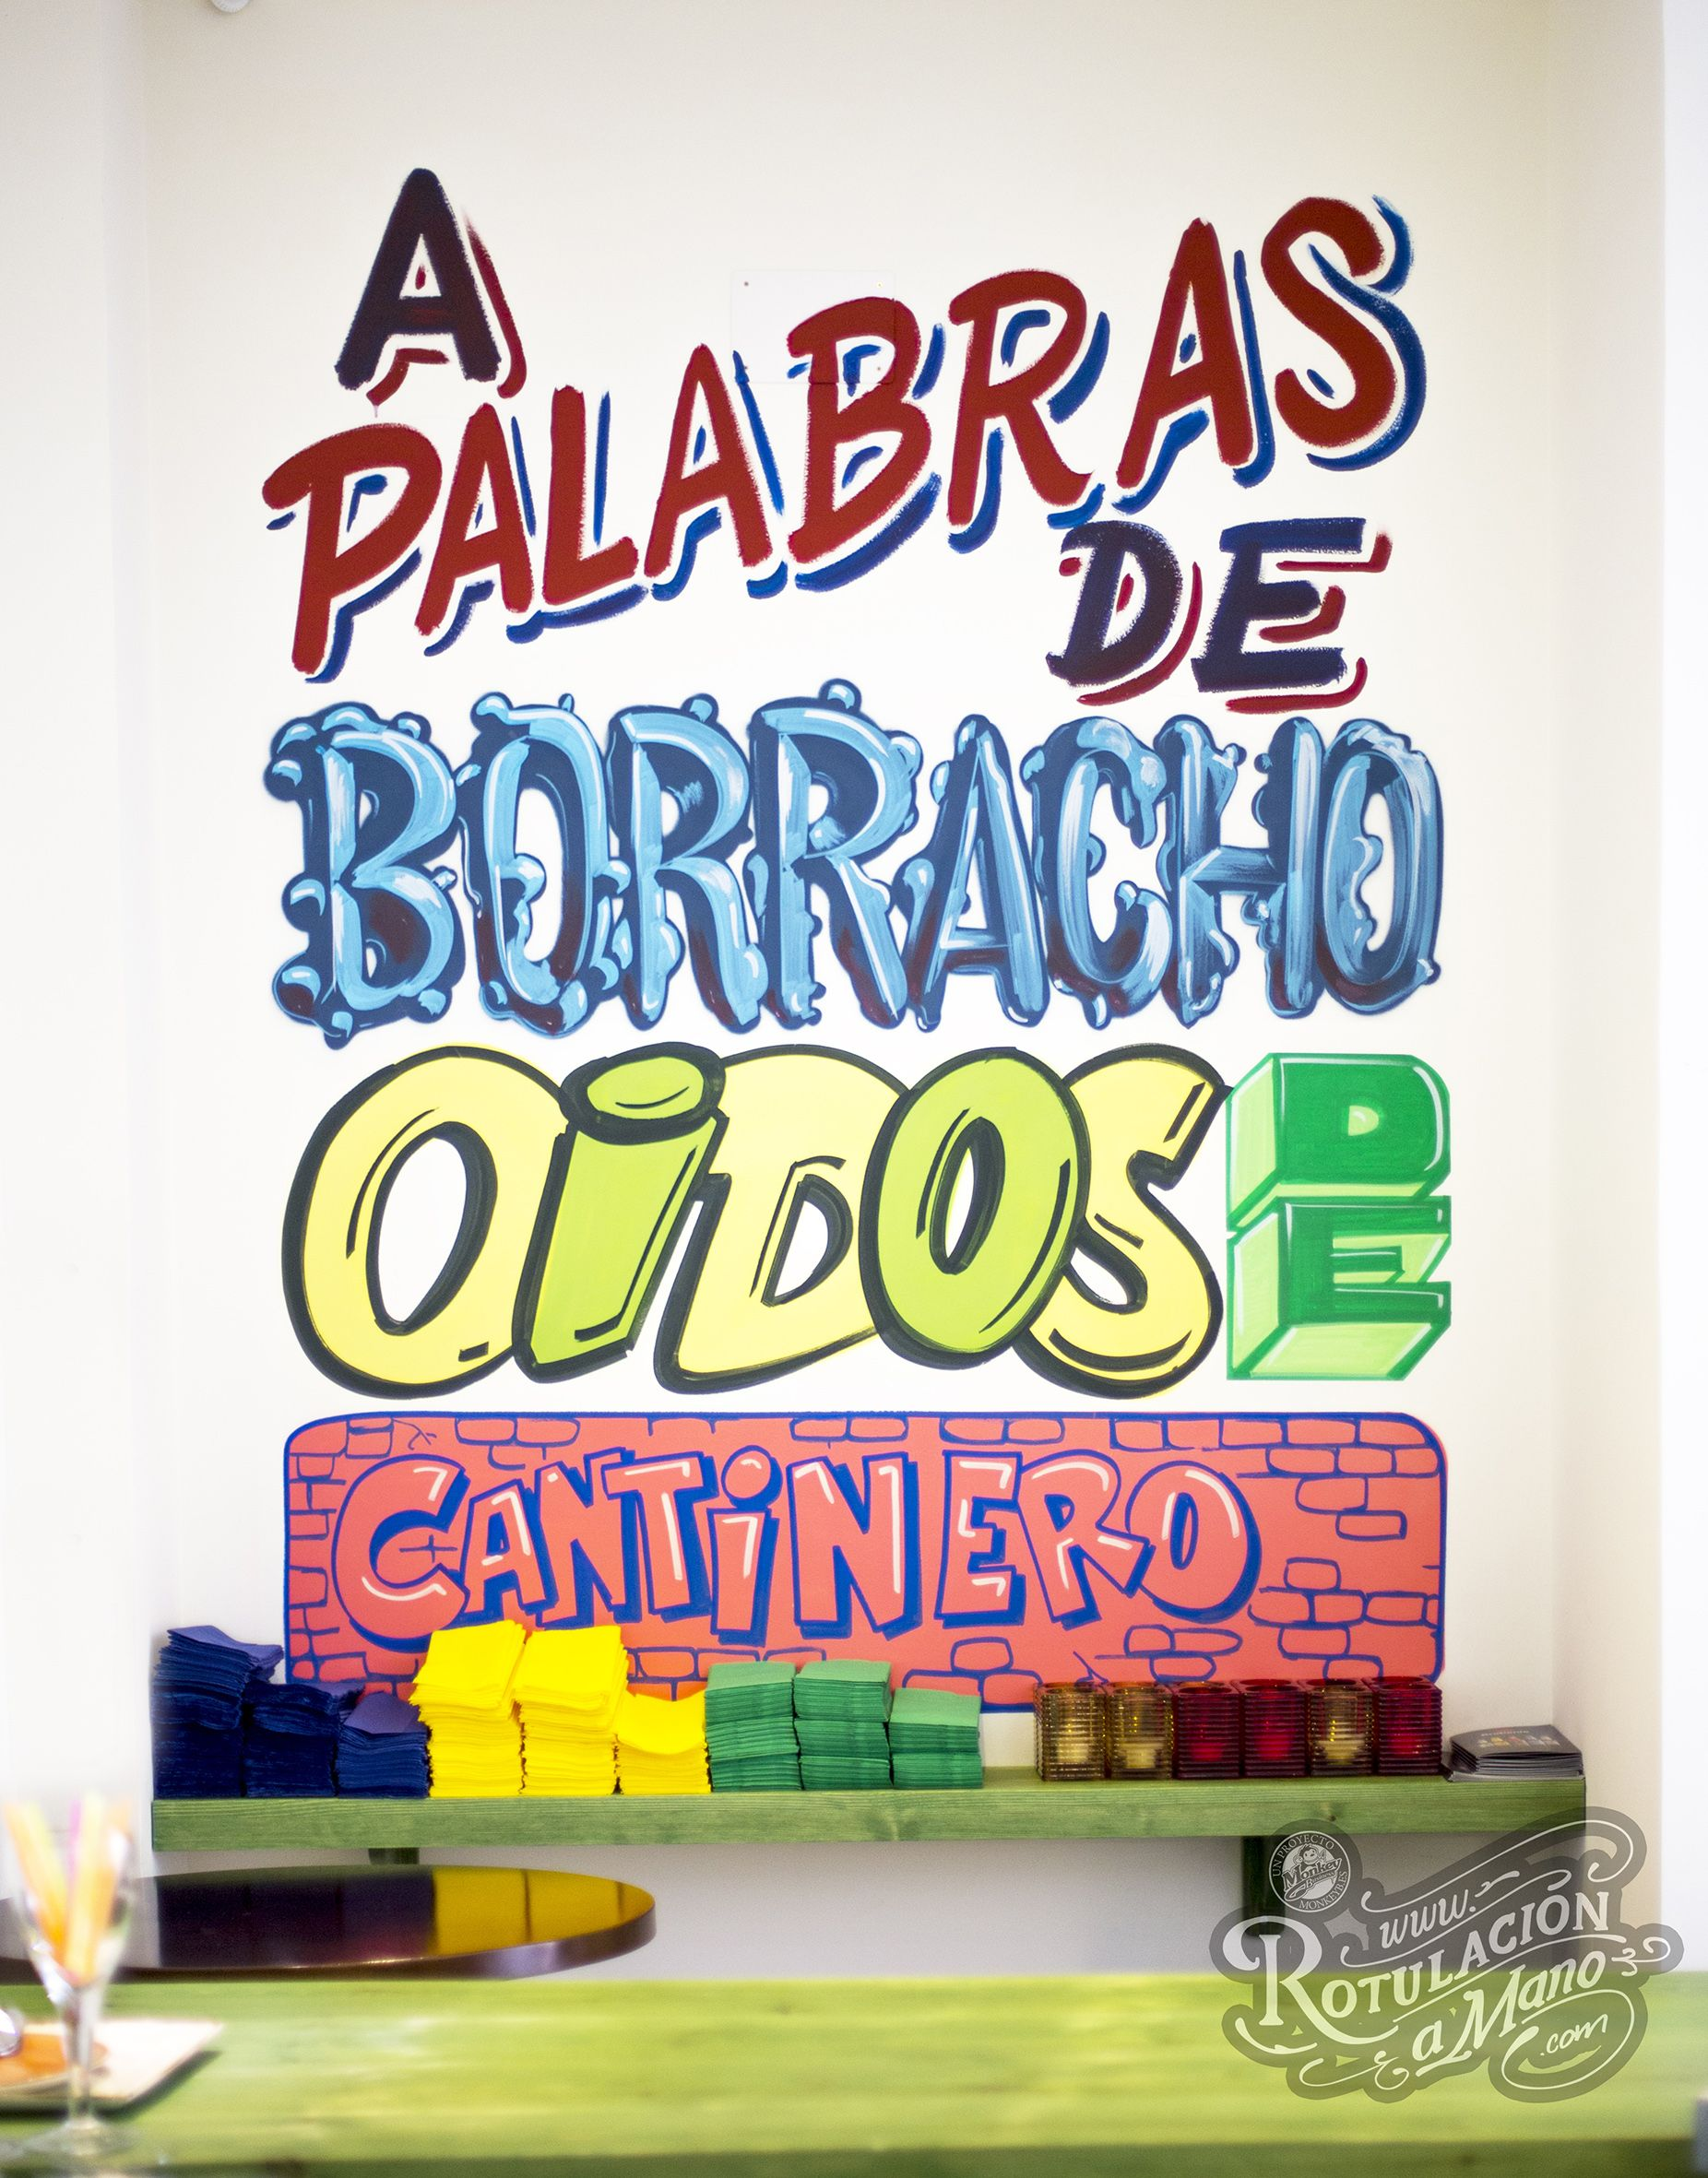 Restaurante colores de m xico en planetocio villalba for Decoracion de restaurantes